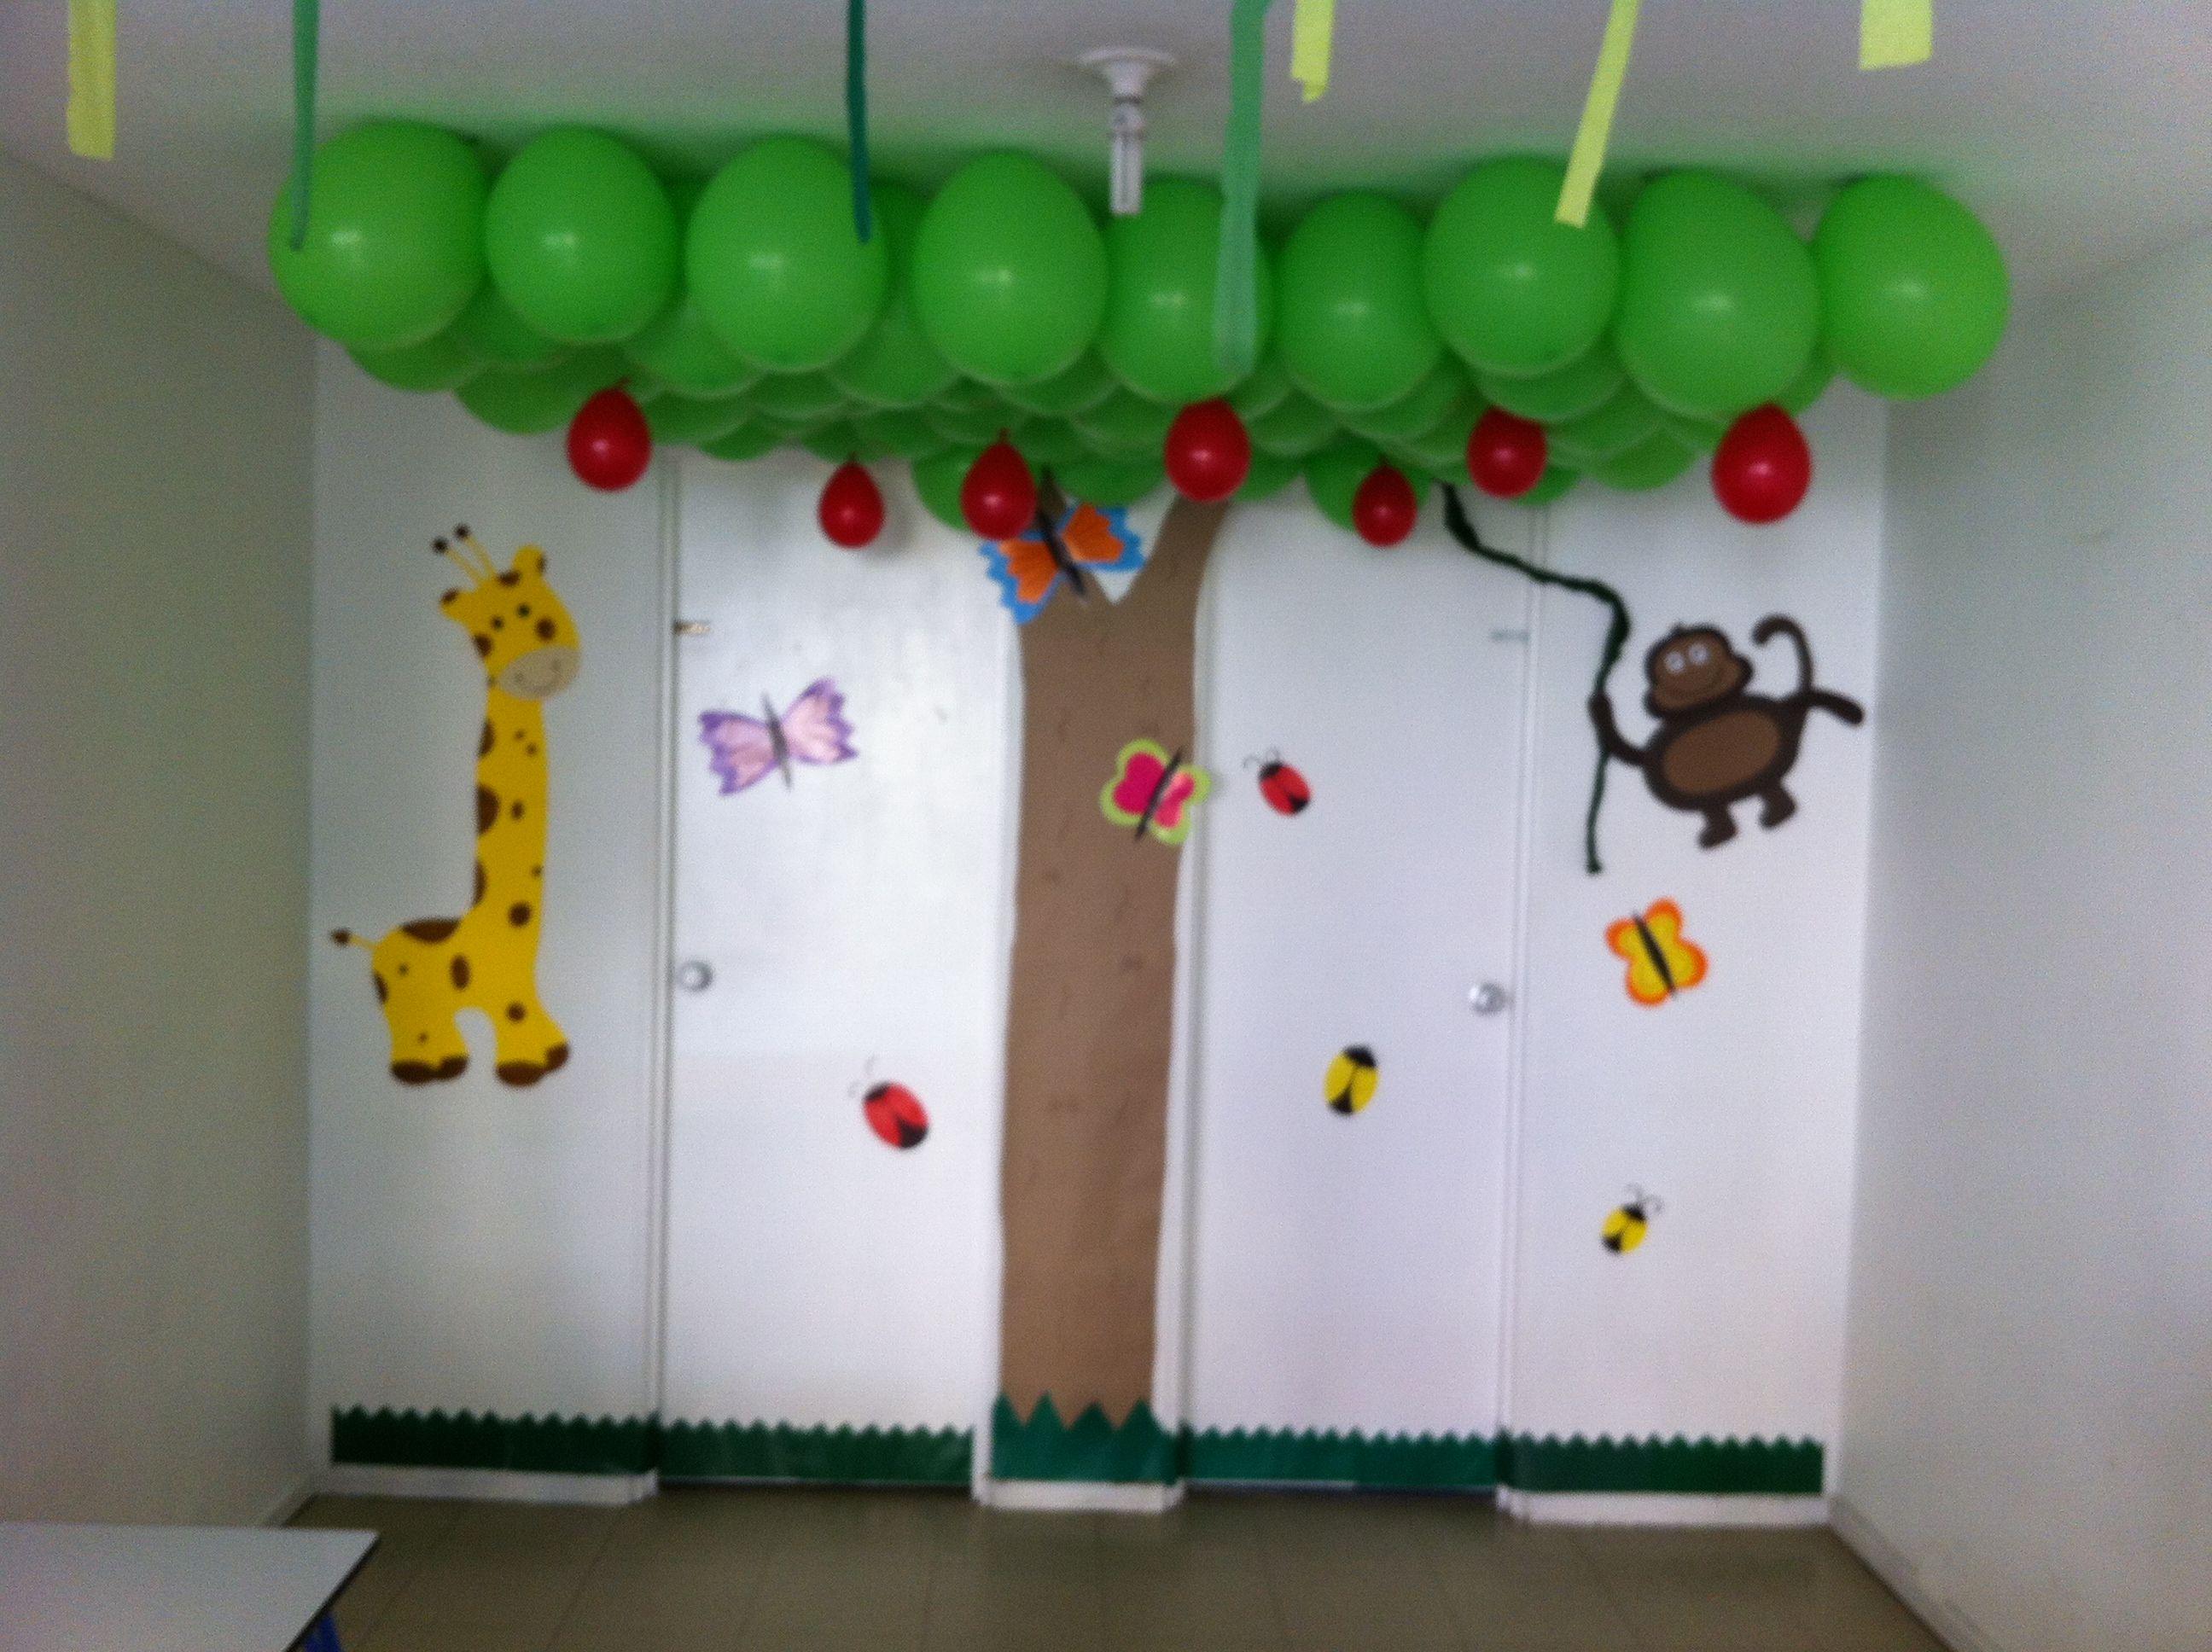 Decoraci n de aula infantil buscant idees de tot un poc for Actividades divertidas para el salon de clases